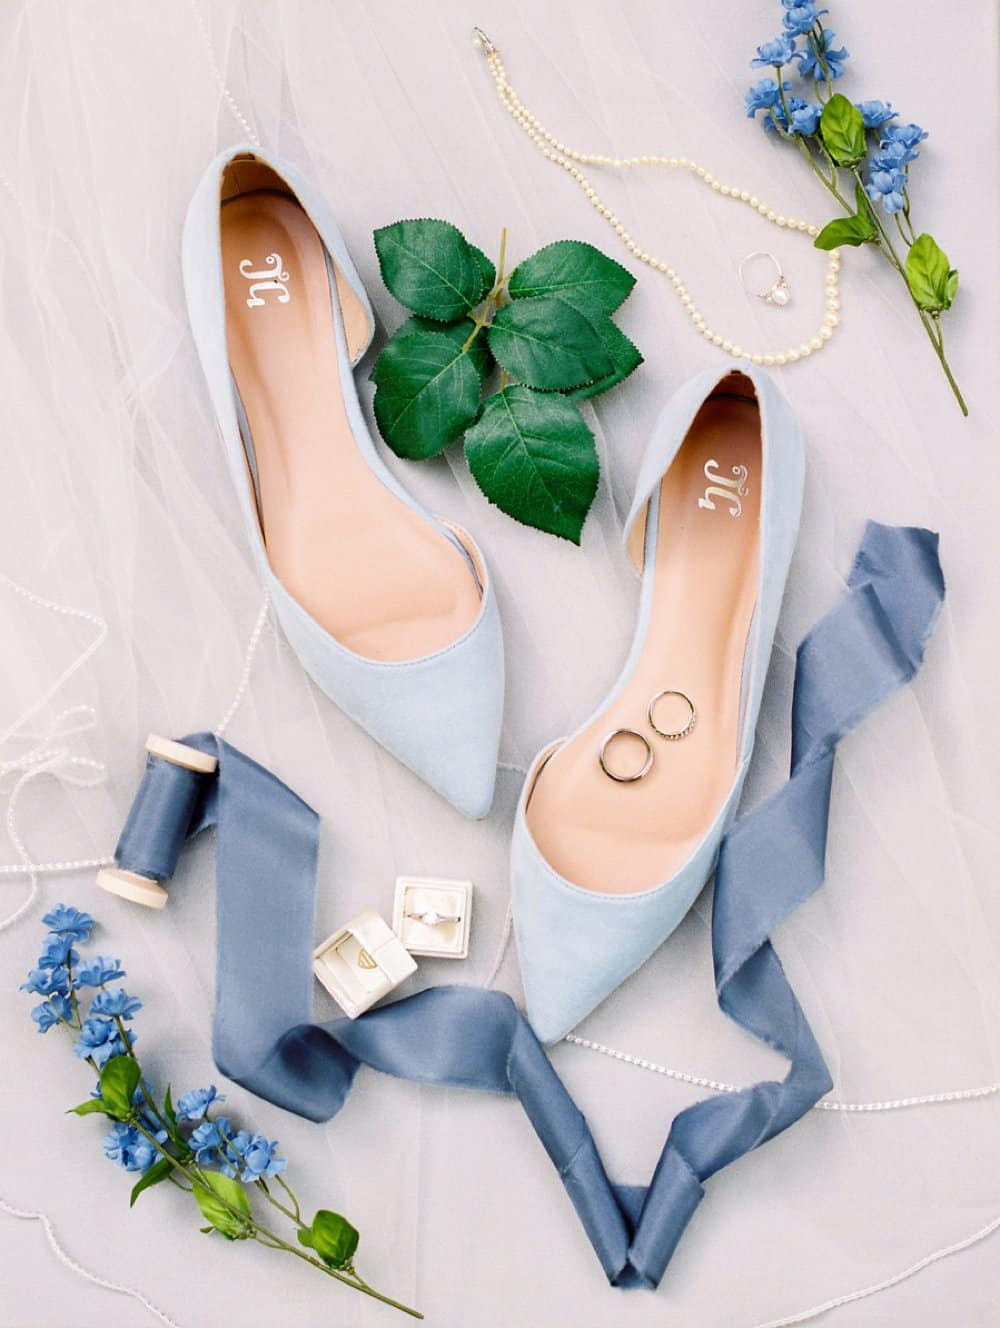 wedding accessories, bride style, wedding photos